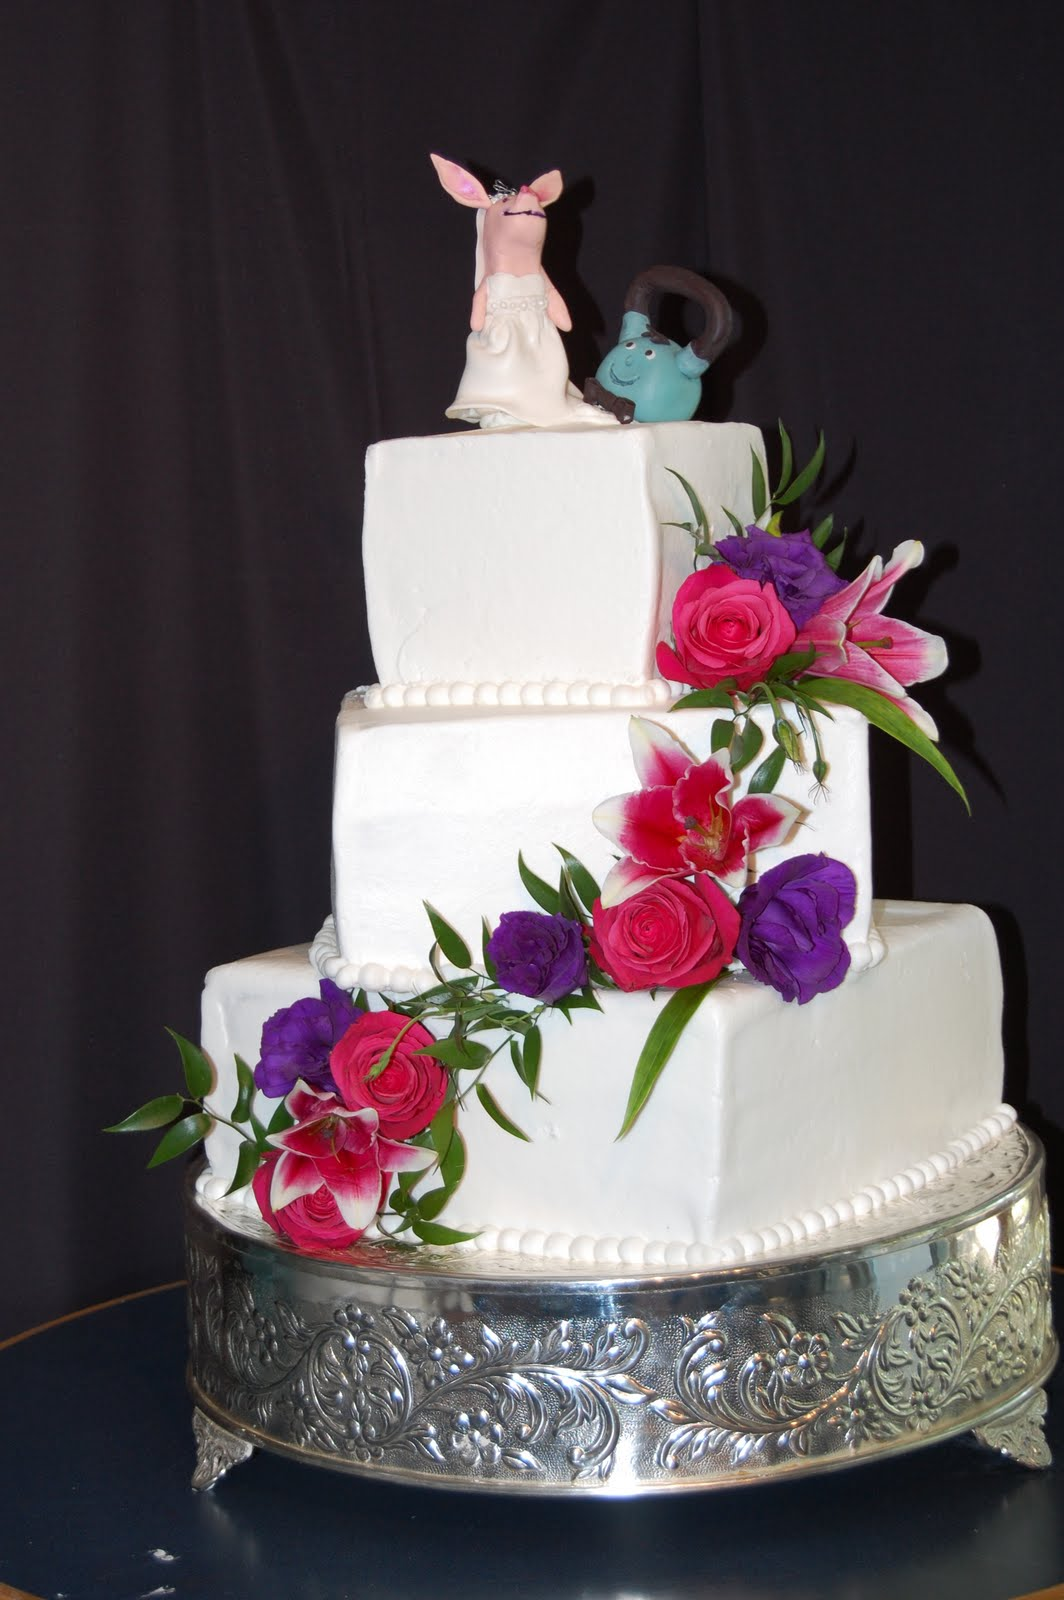 Kims Cake Studio Olivia The Pig And Kettlebell Wedding Cake